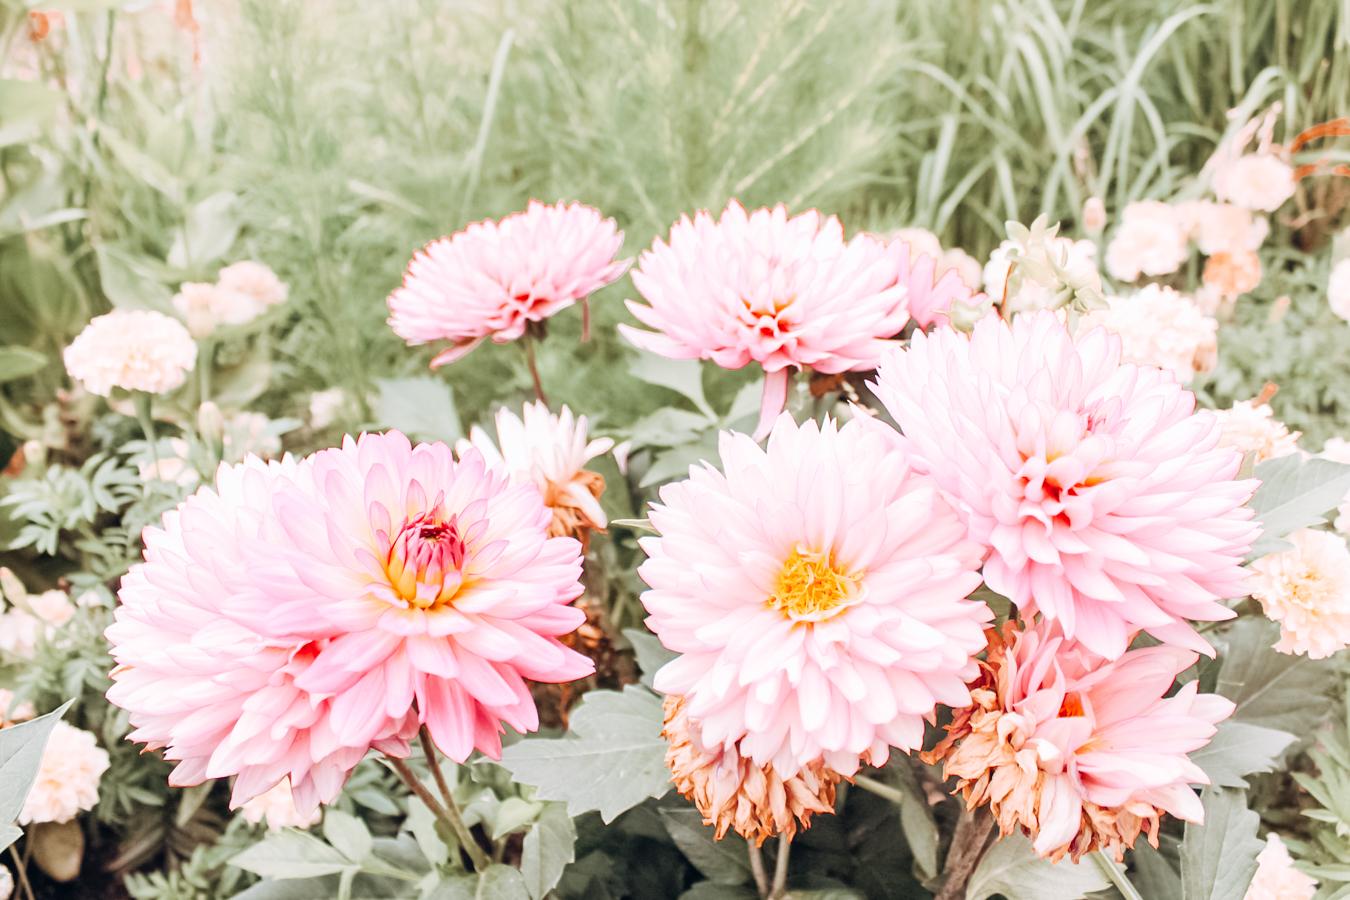 Flowers at Denver Botanical Garden